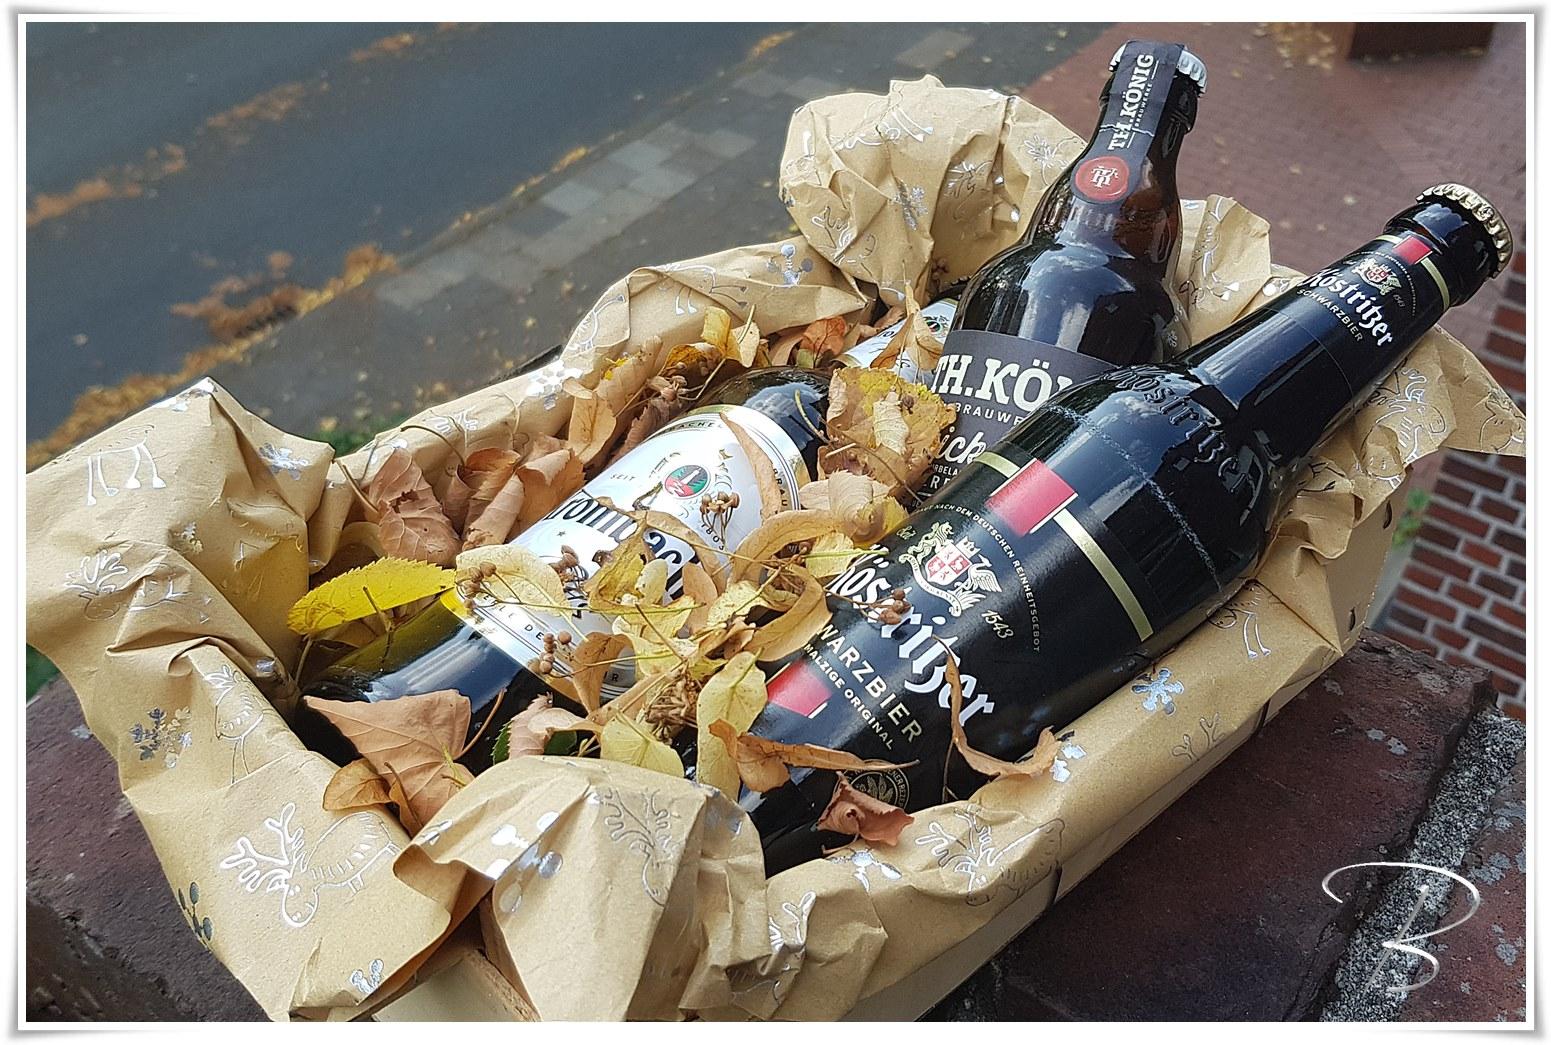 Billes Bastelblog Bastel Dir Lebensfreude Biergarten